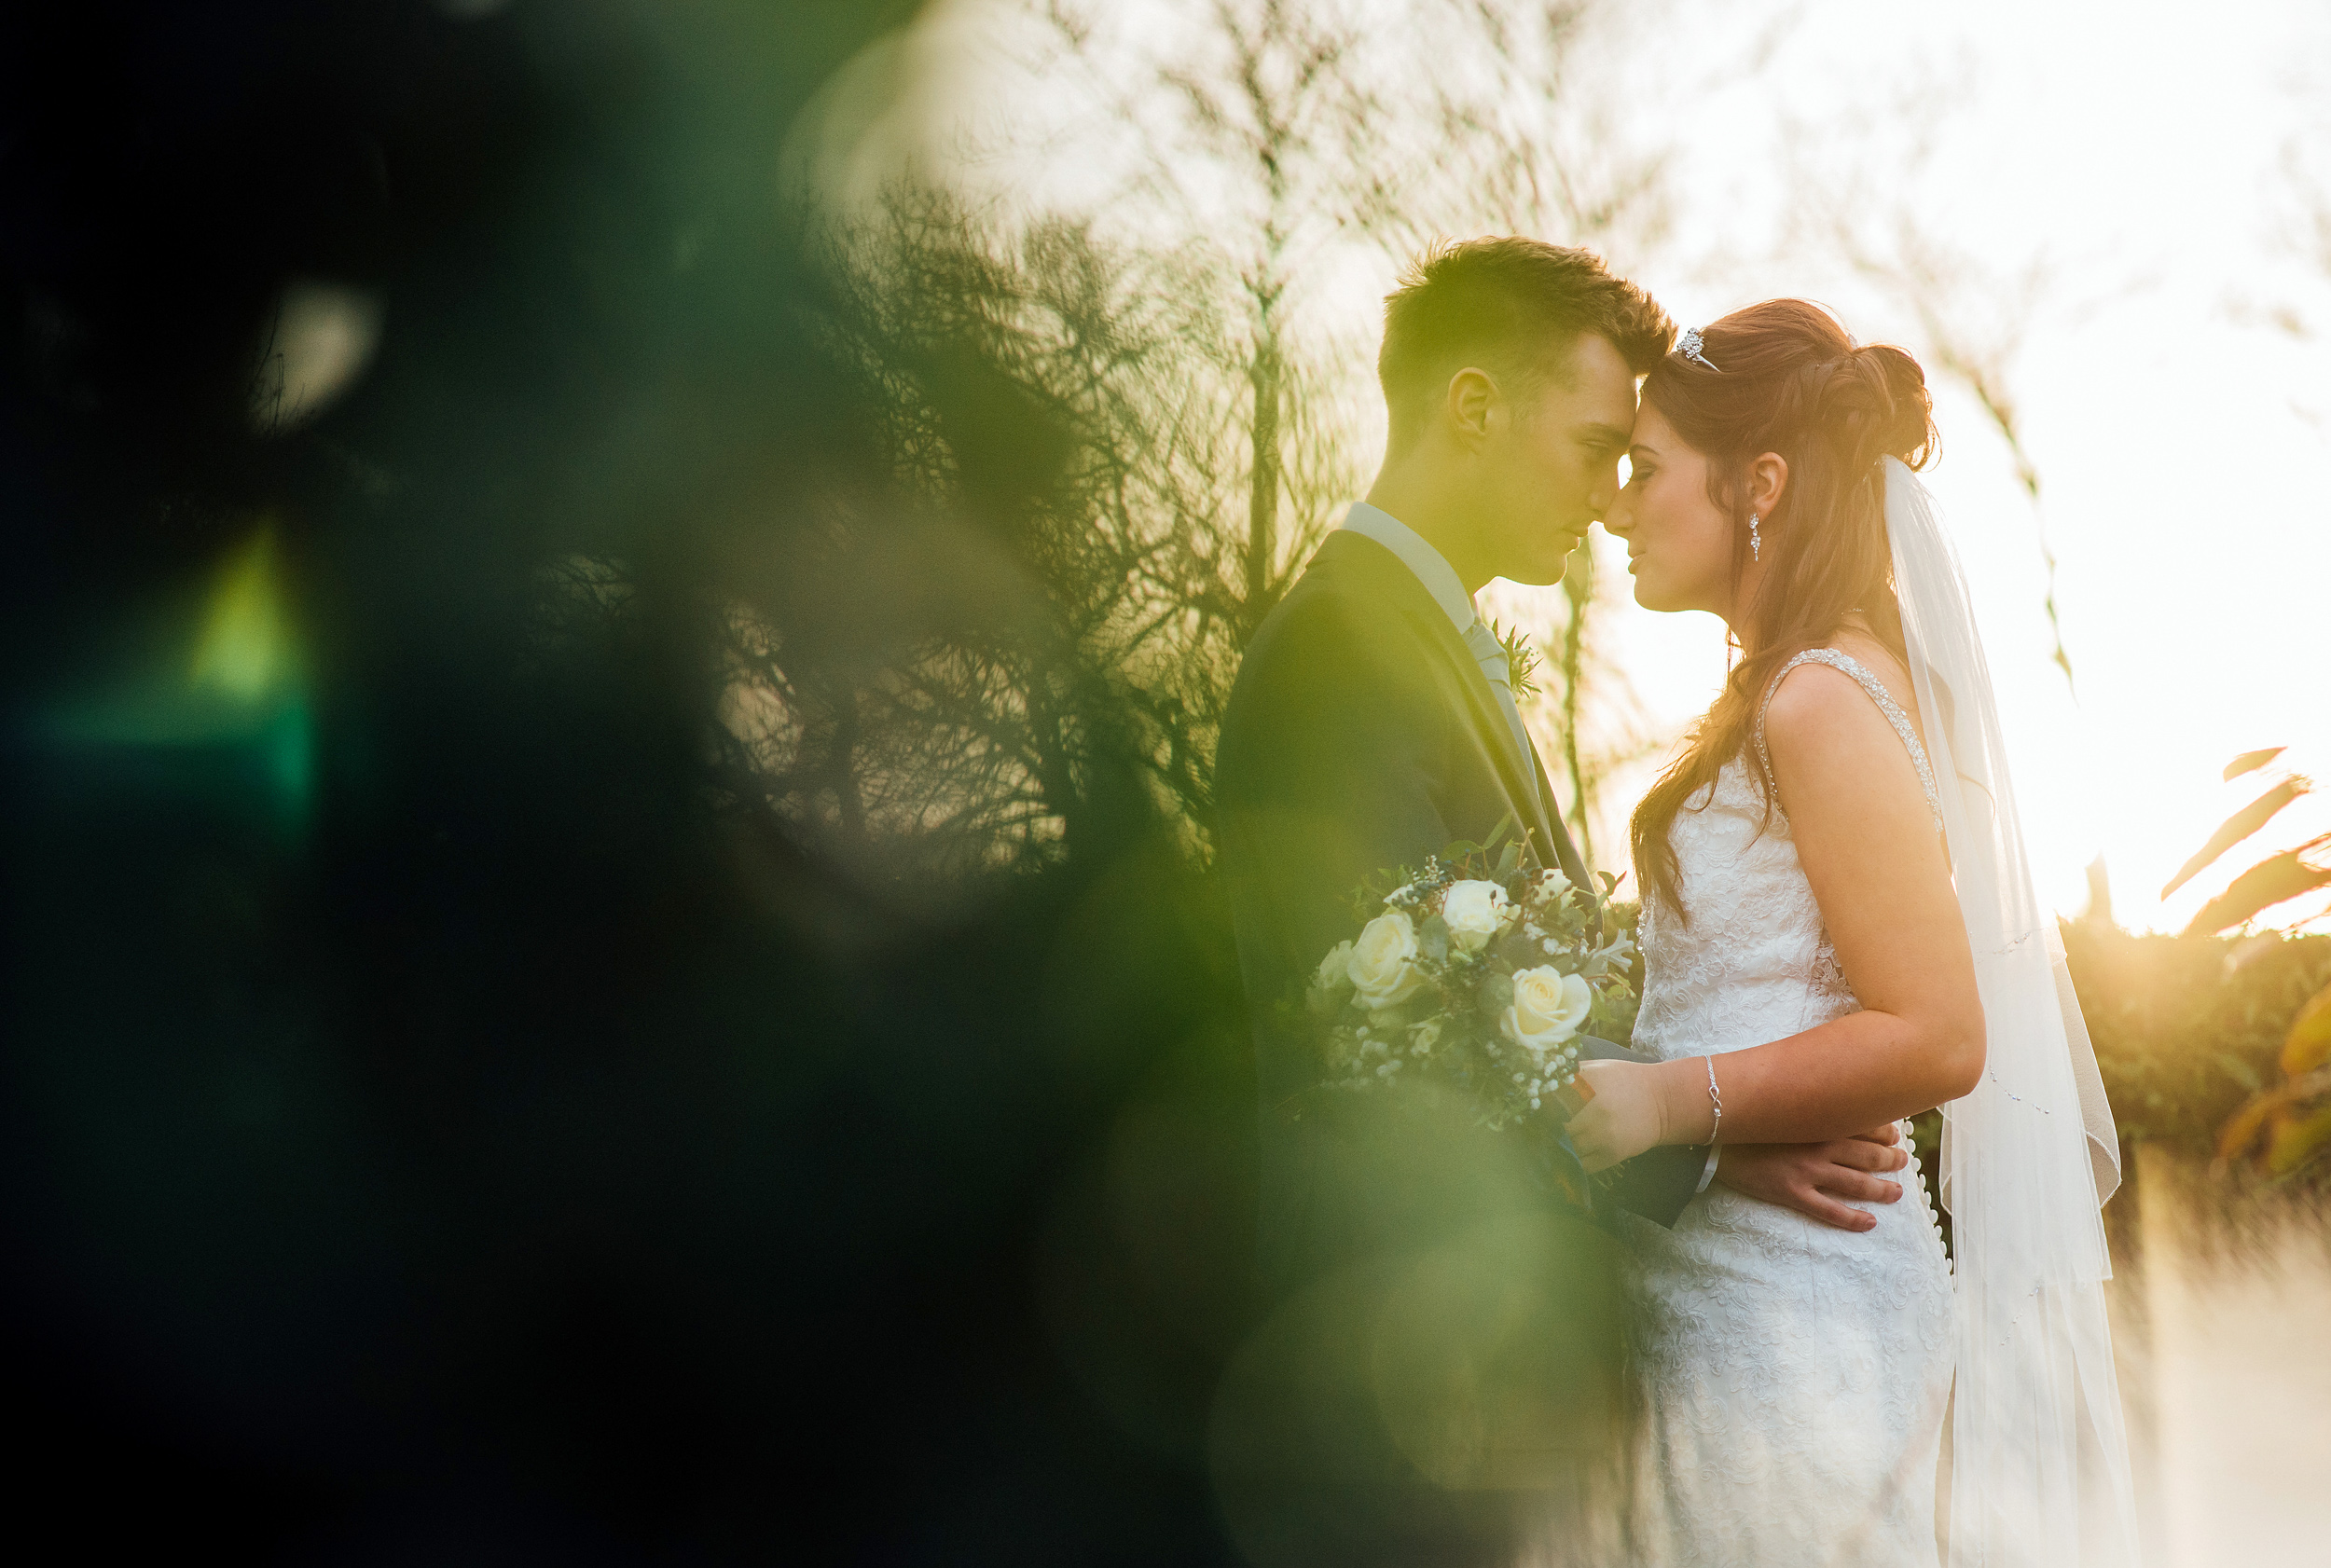 David Scholes Lancashire wedding photography 2016-195.jpg